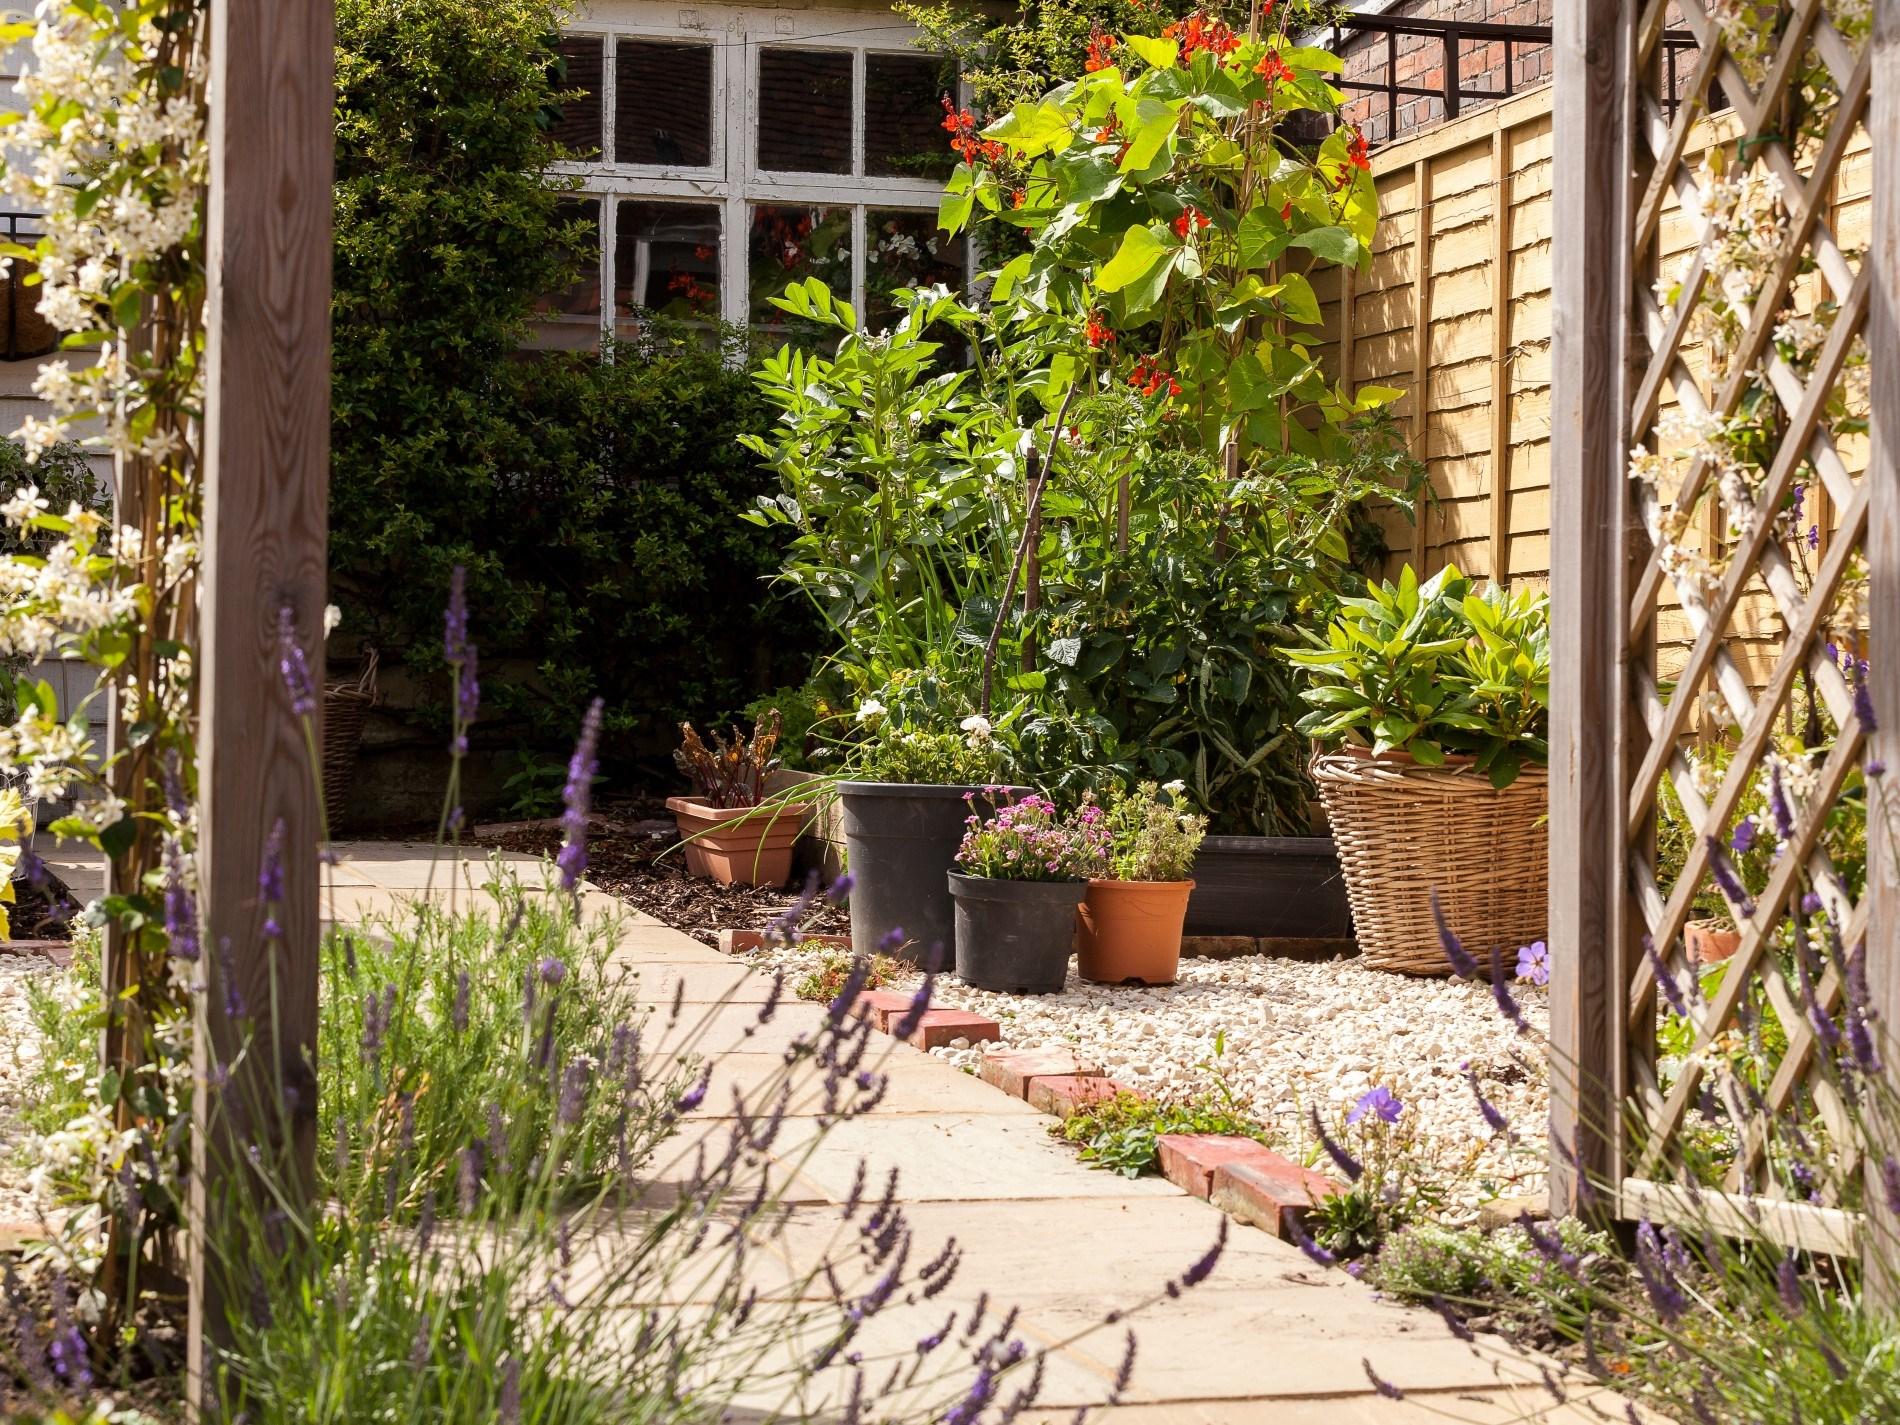 Beautifully designed garden